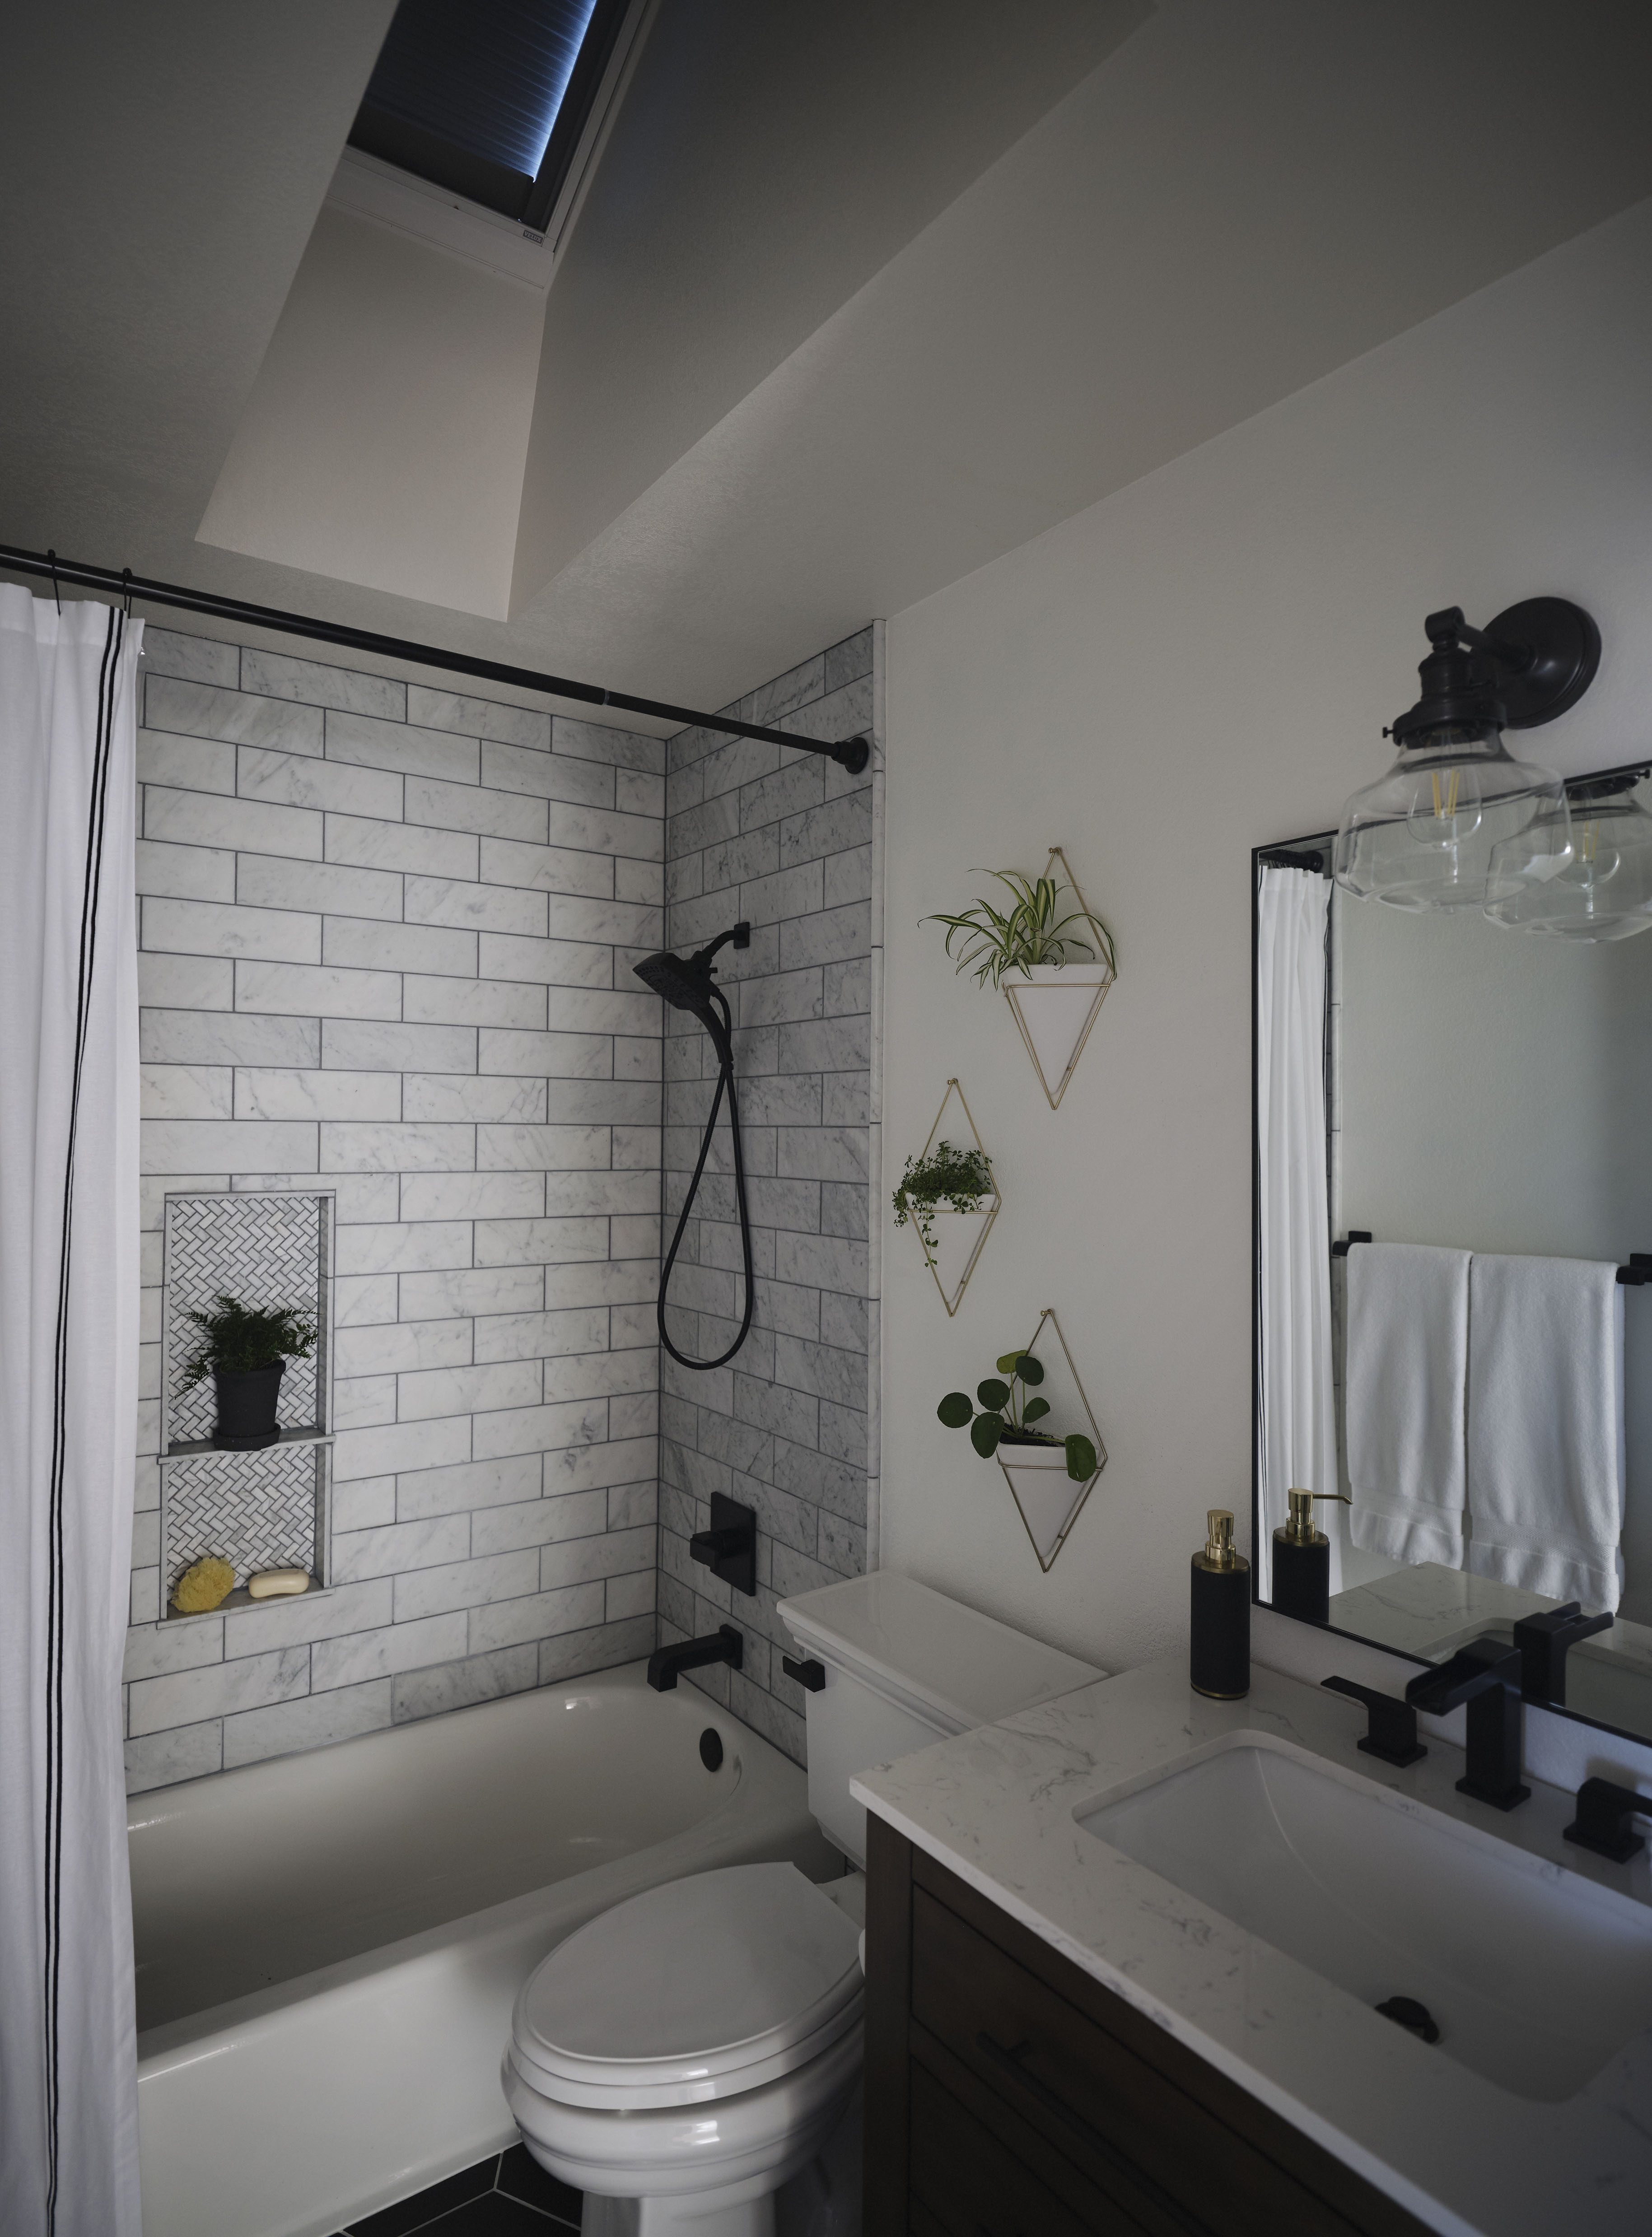 Design Solutions For Small Dark Bathrooms